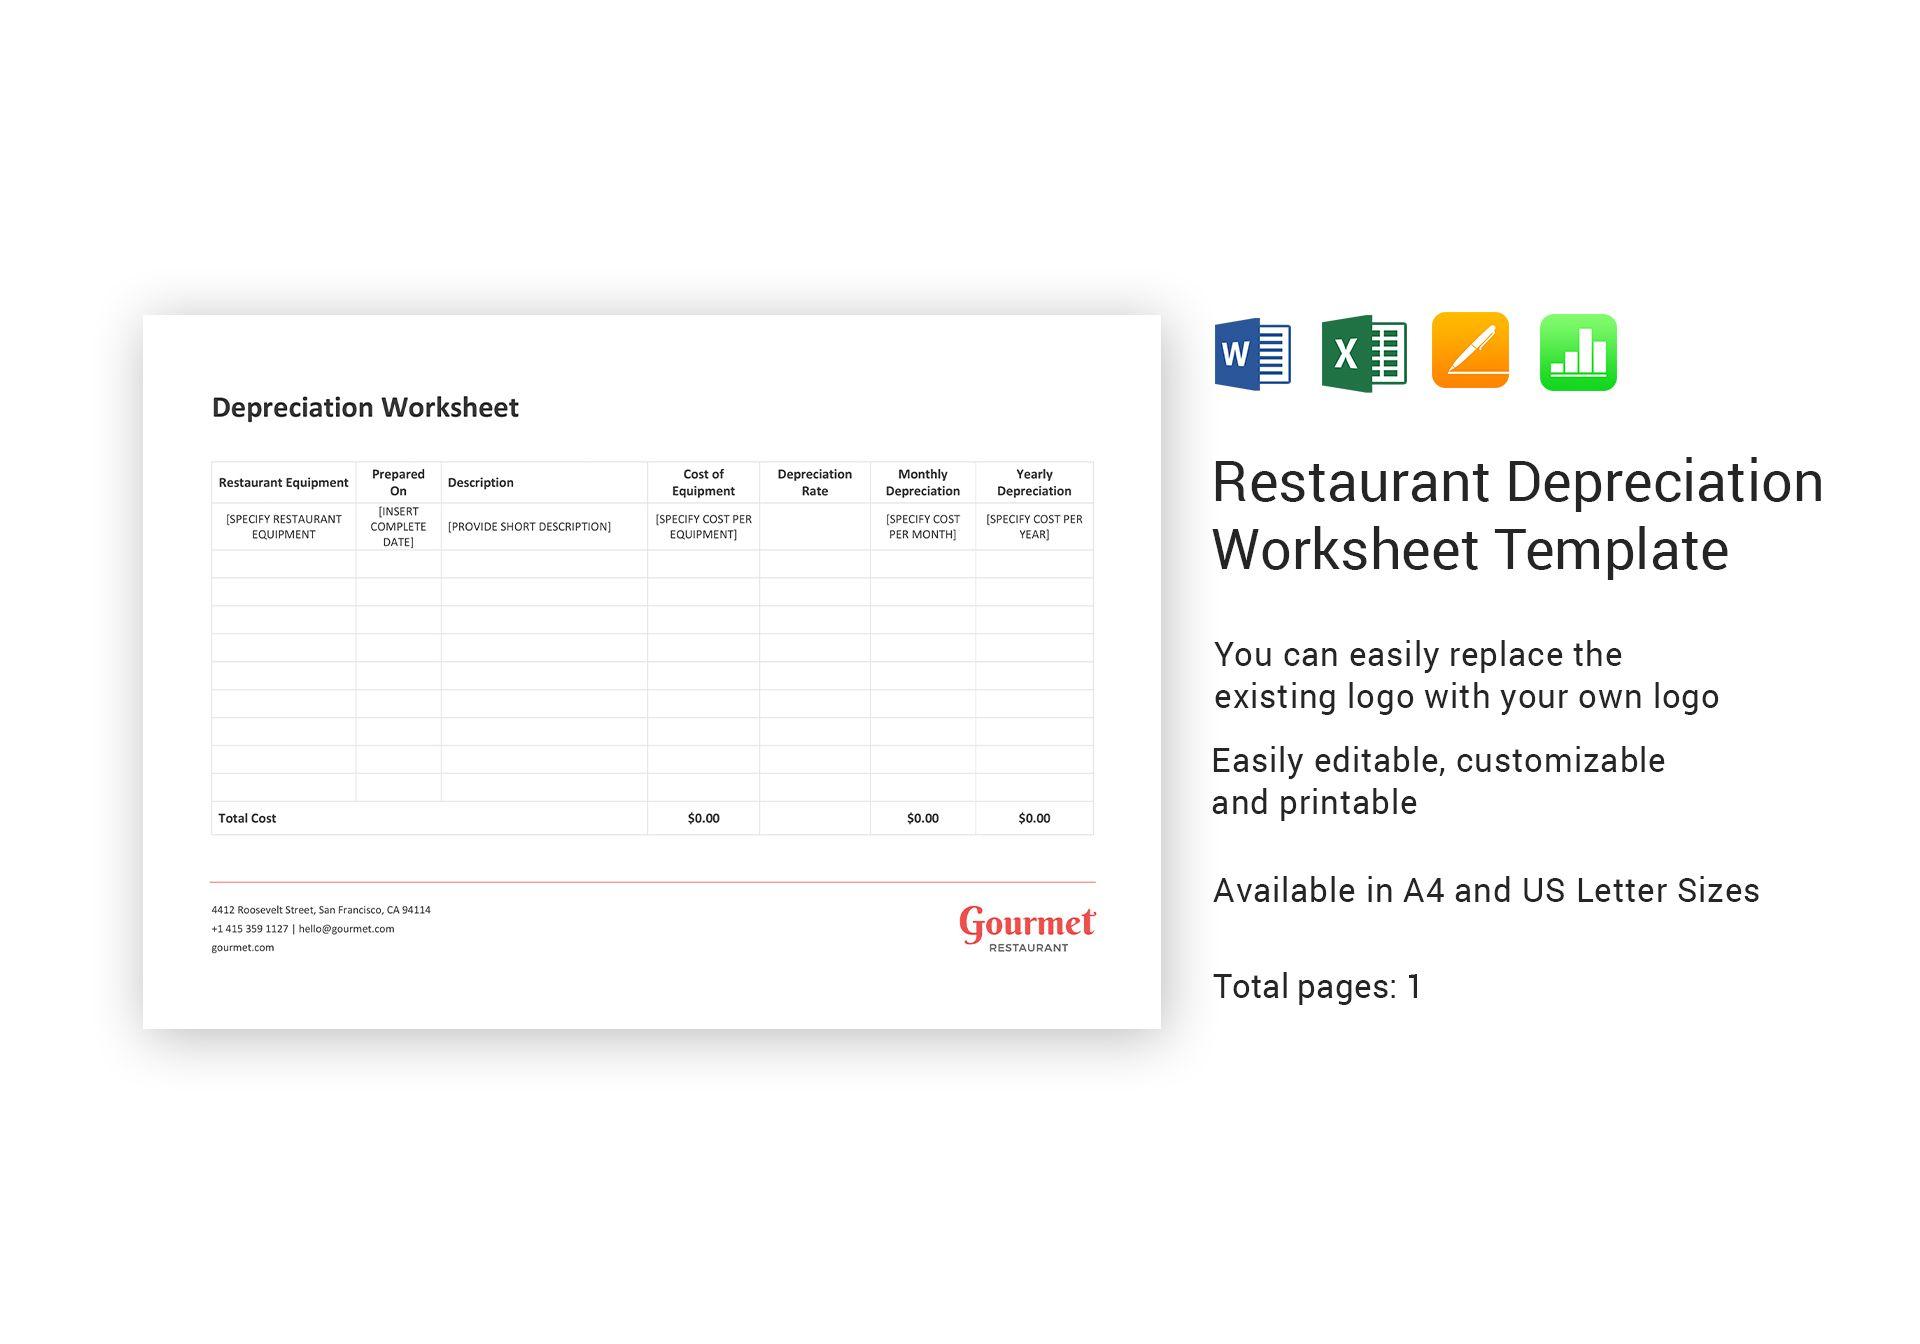 Restaurant Depreciation Worksheet Template In Word Excel